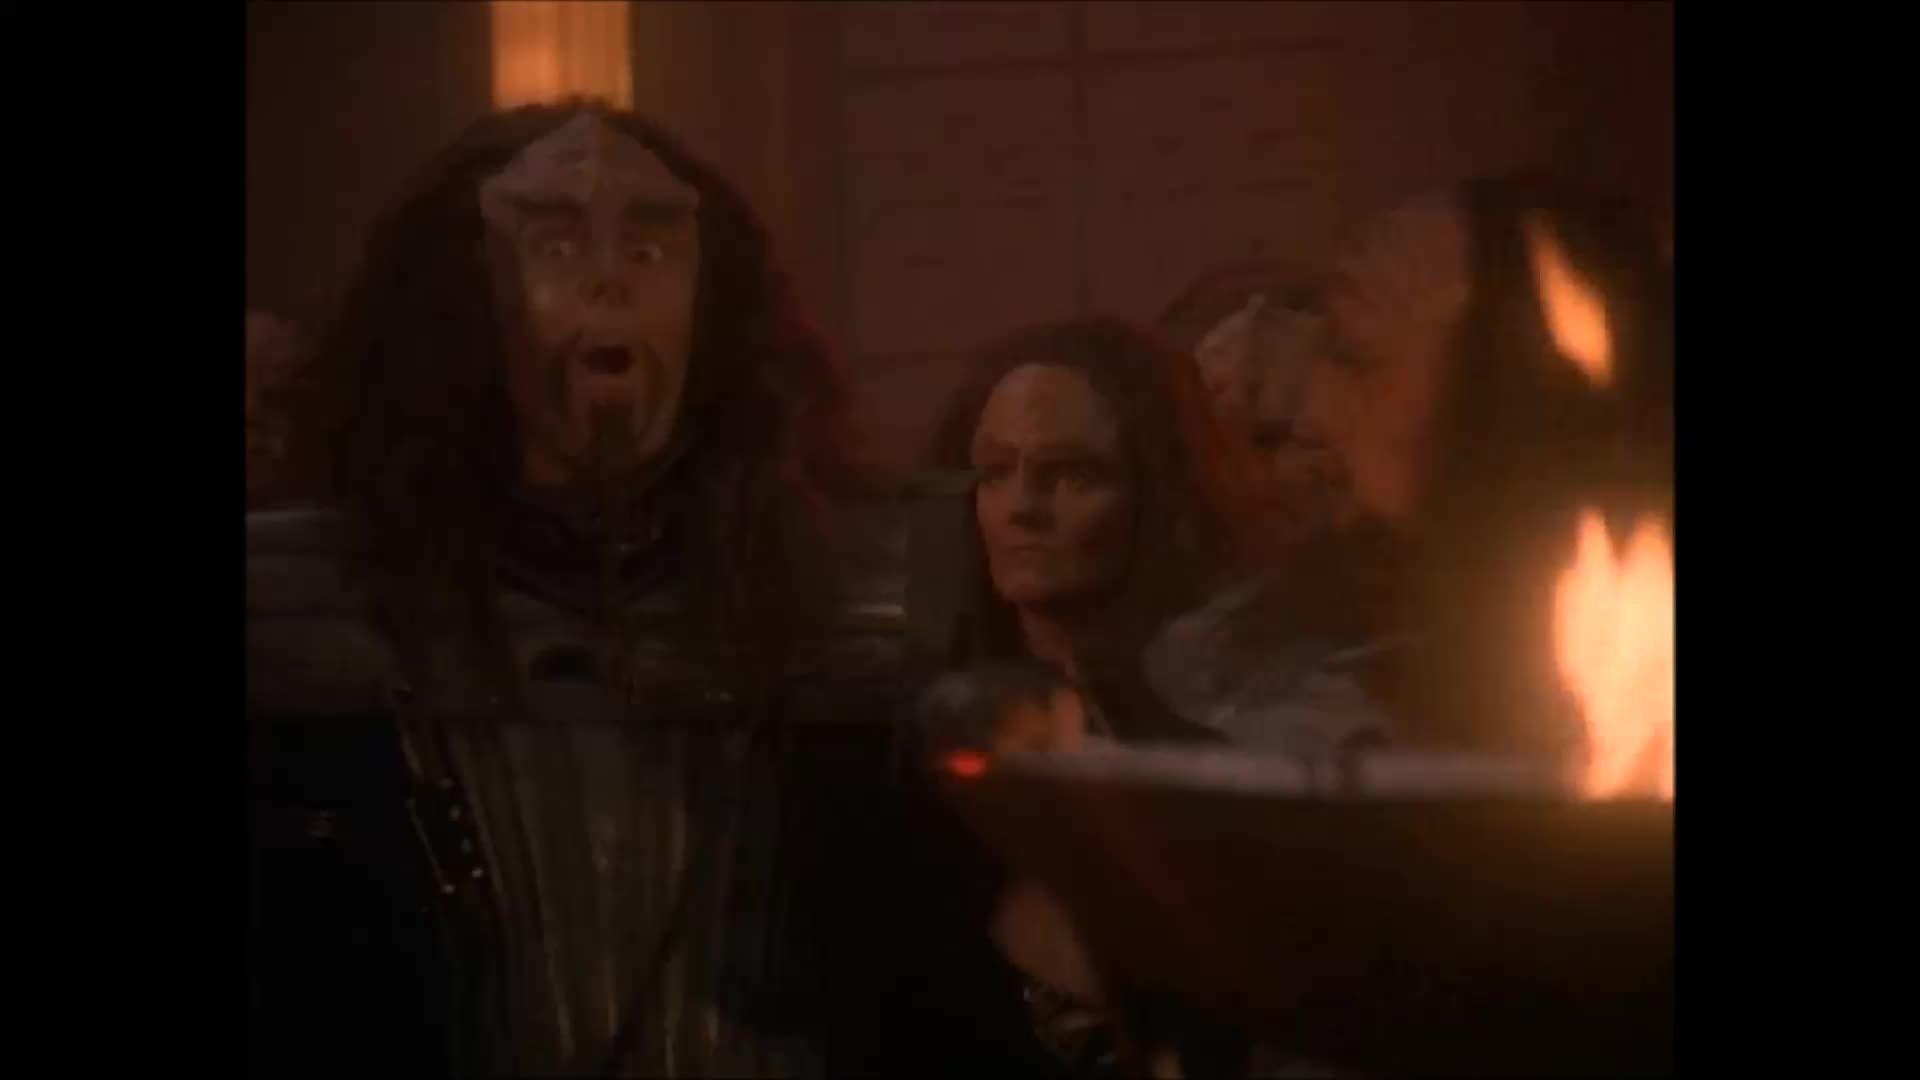 asksciencefiction, movies, startrek, Excited Klingon GIFs